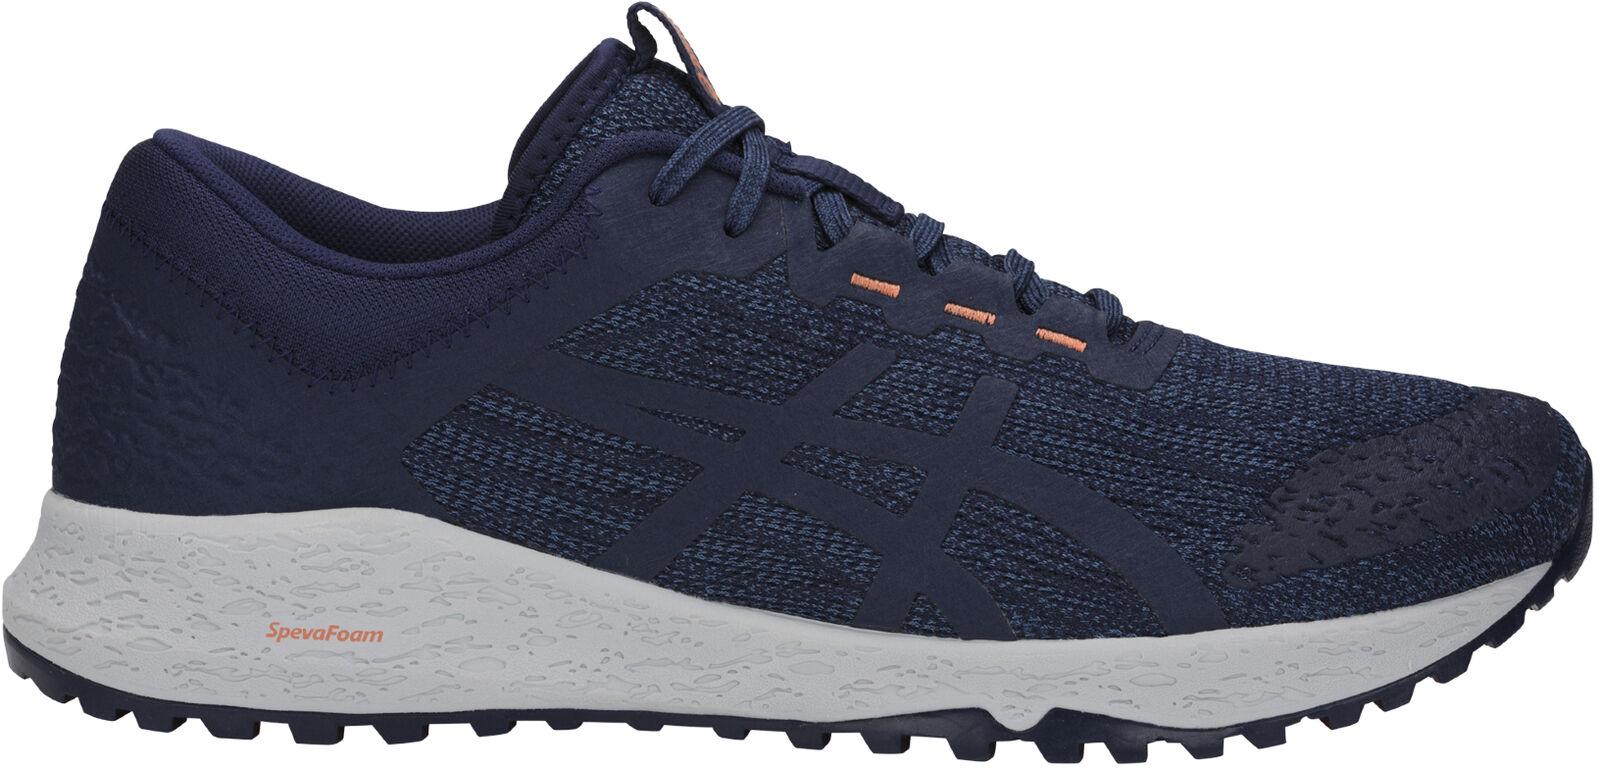 Zapatos Trail Asics Azul Running Osxyin5370 Xt Hombre Para Alpine 3jq54LAR